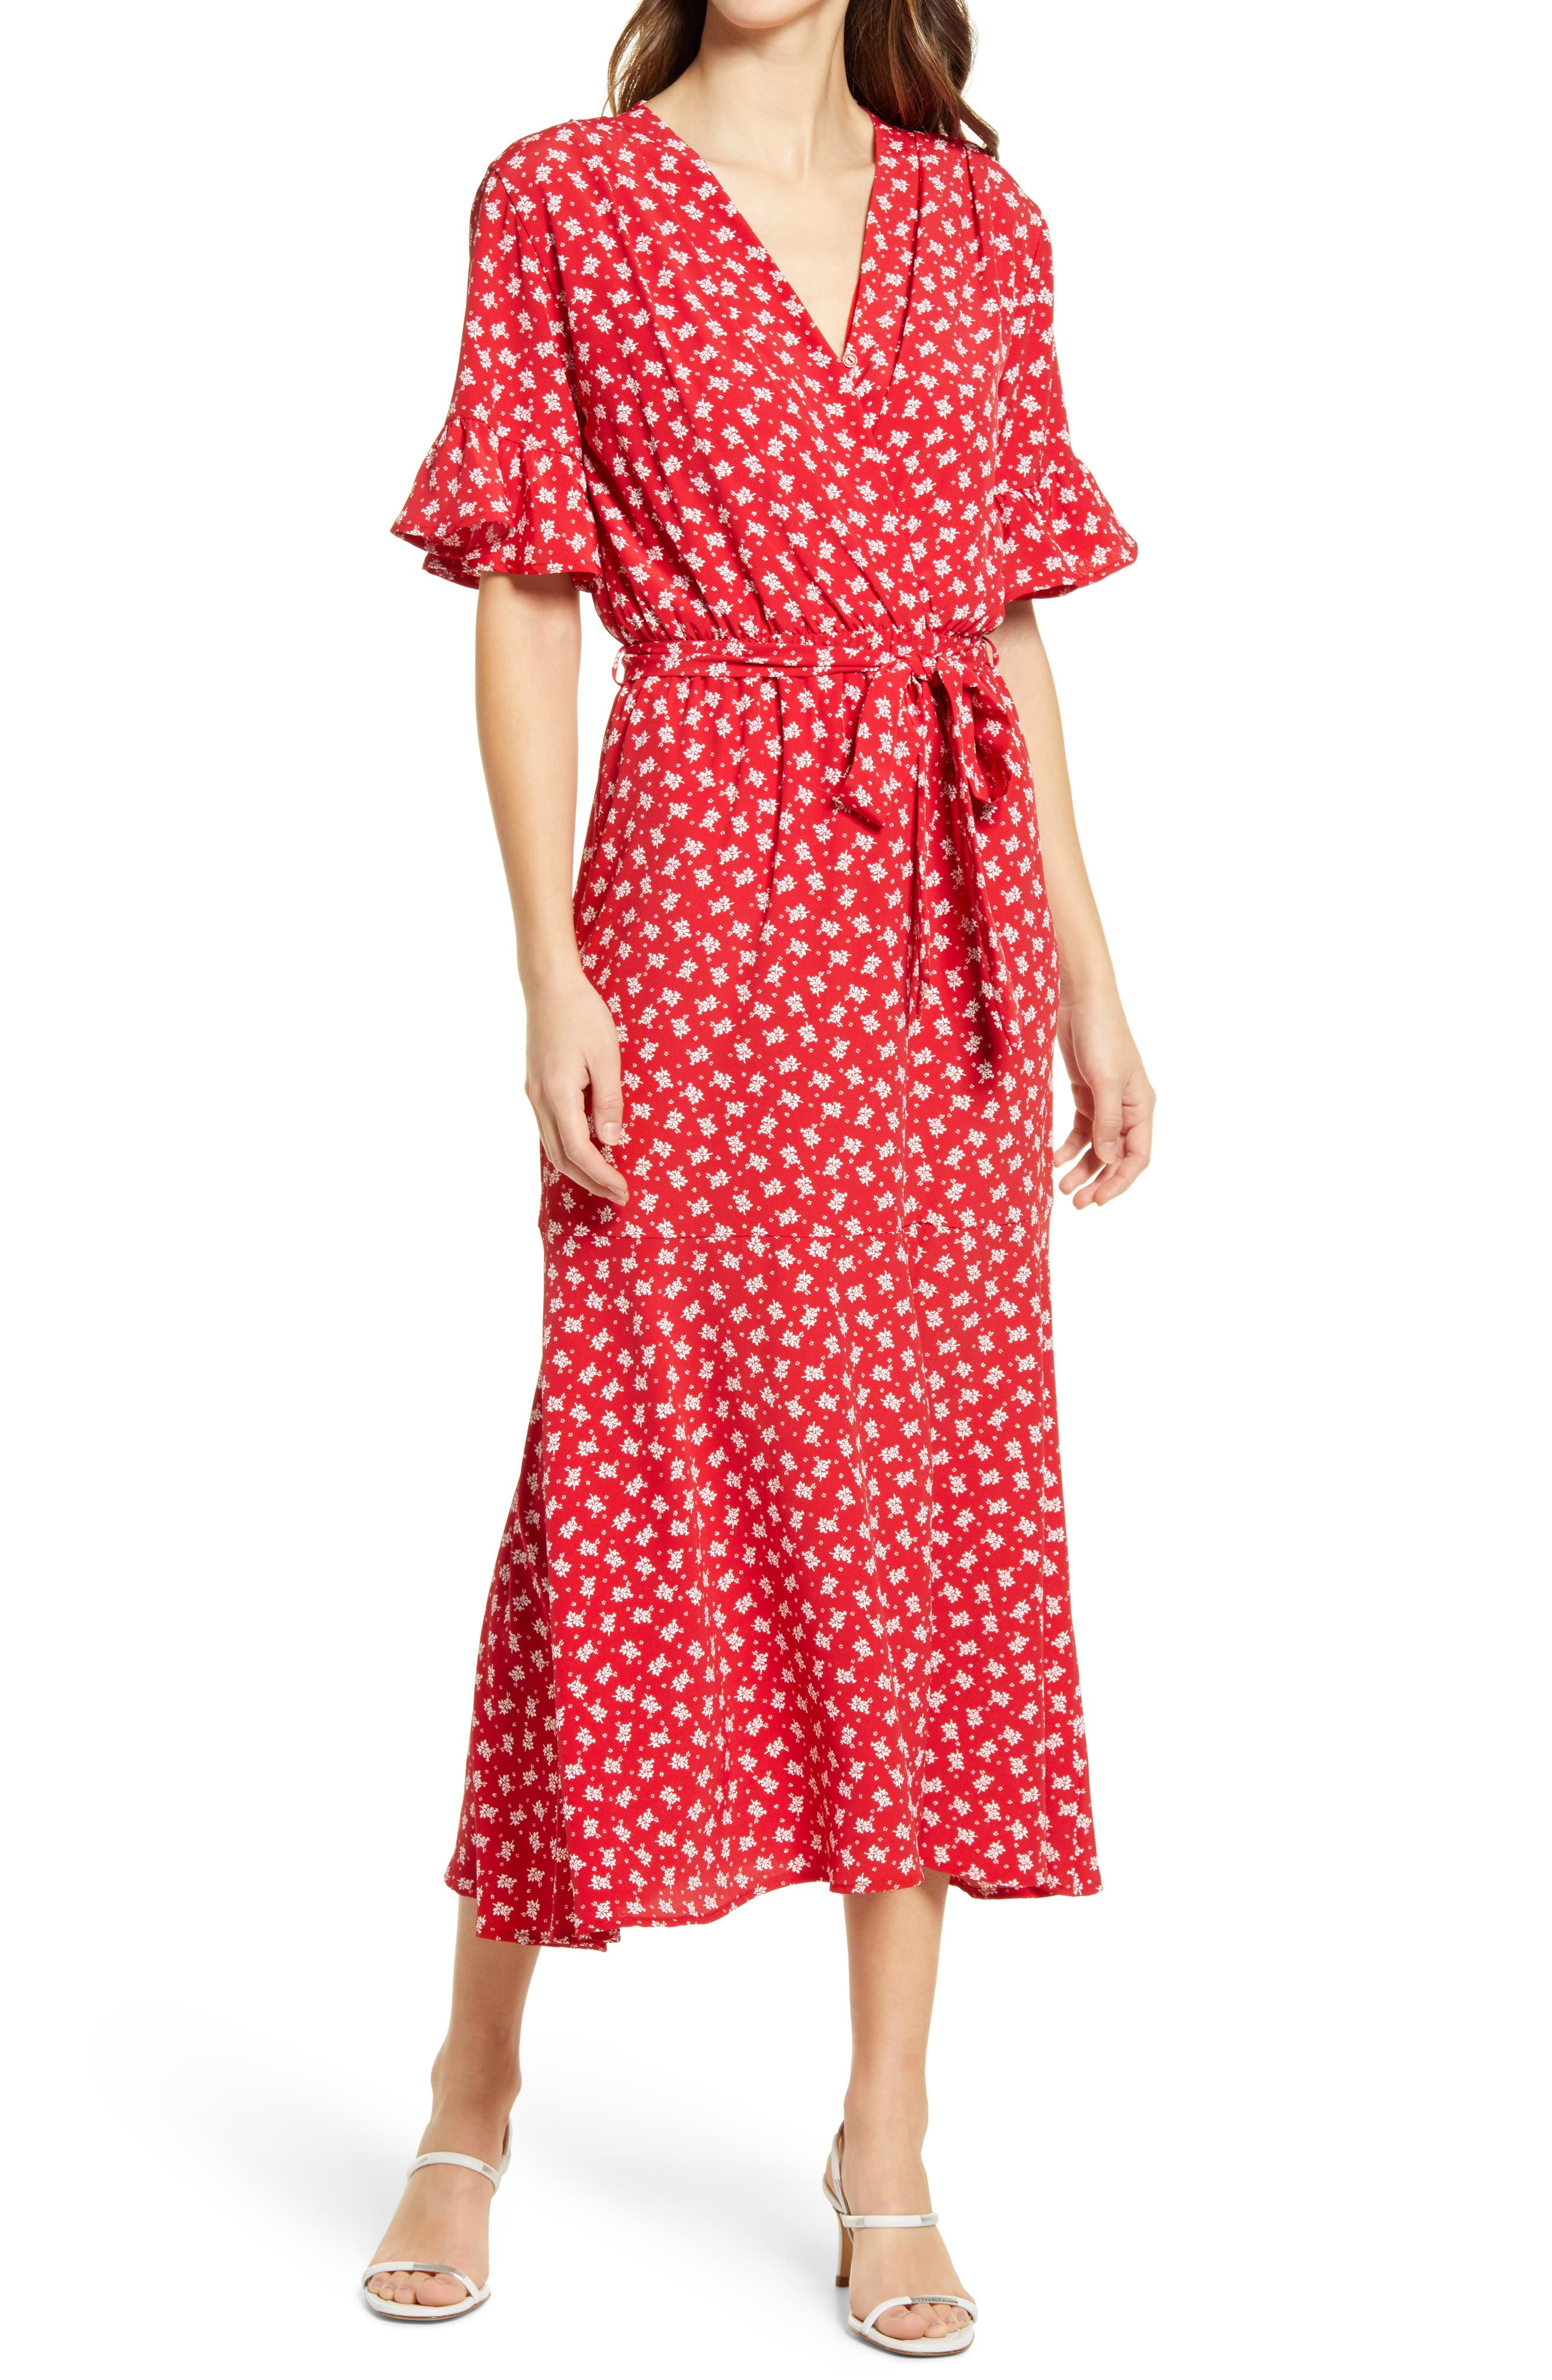 Jura Ruffle Sleeve Midi Dress